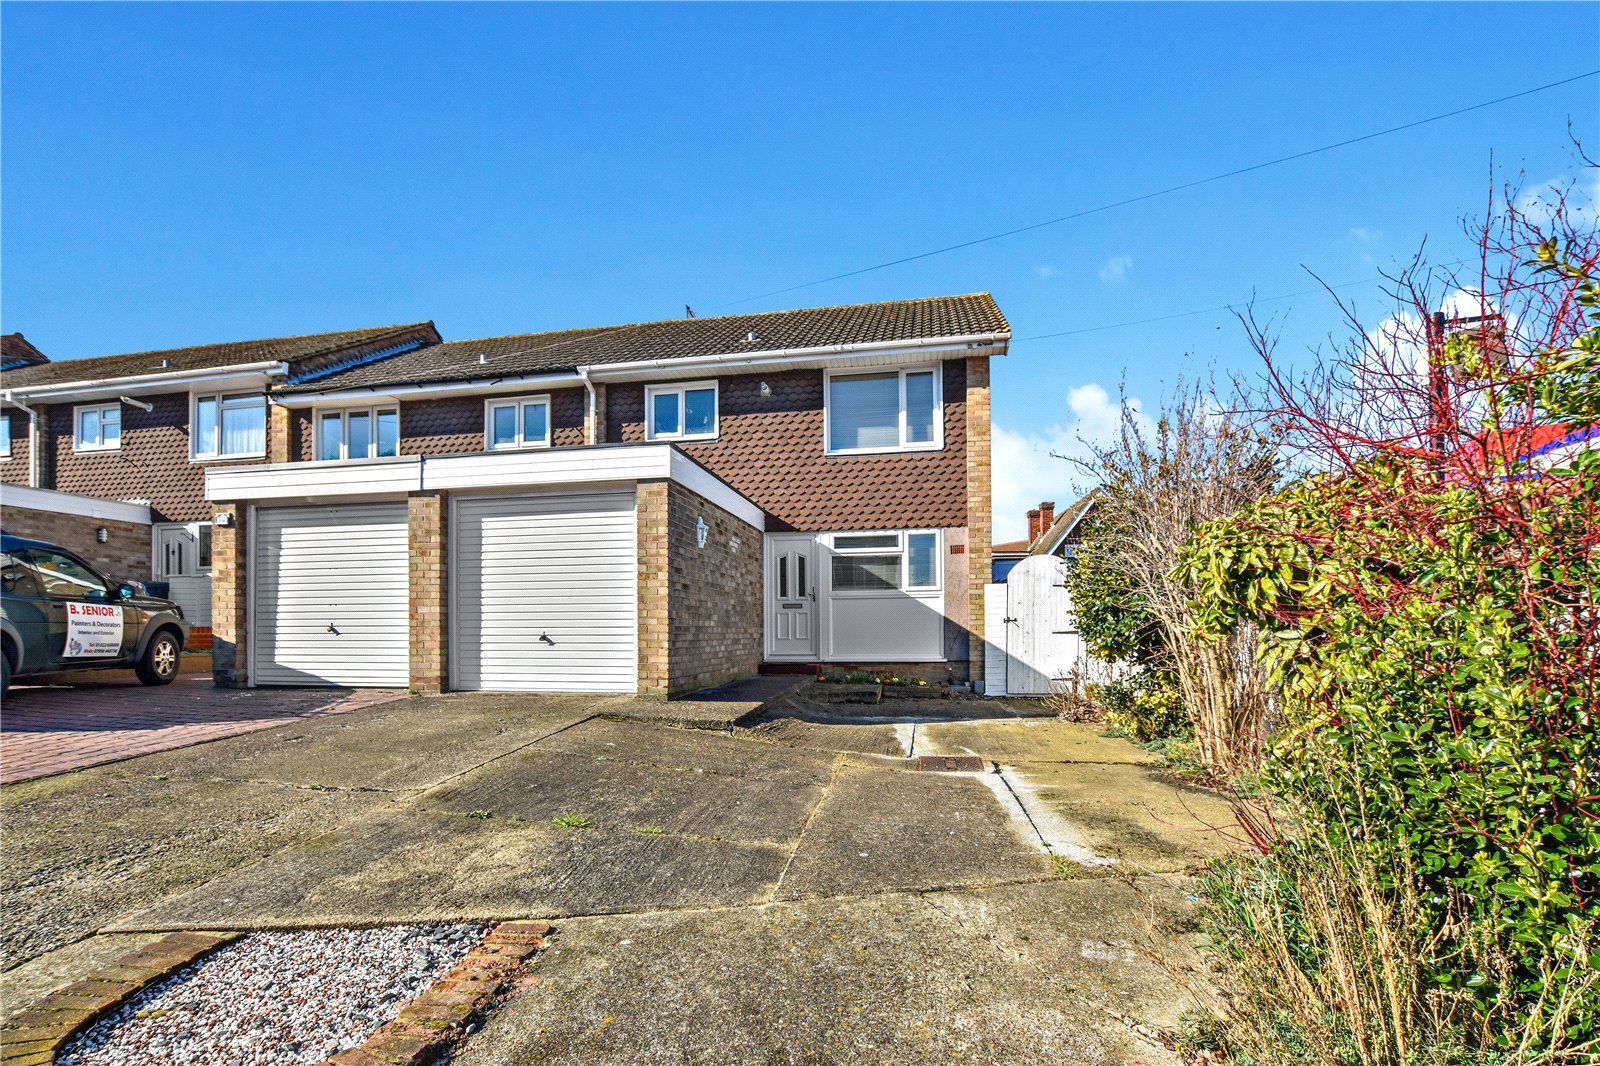 Summerhouse Drive, Joydens Wood, Kent, DA5